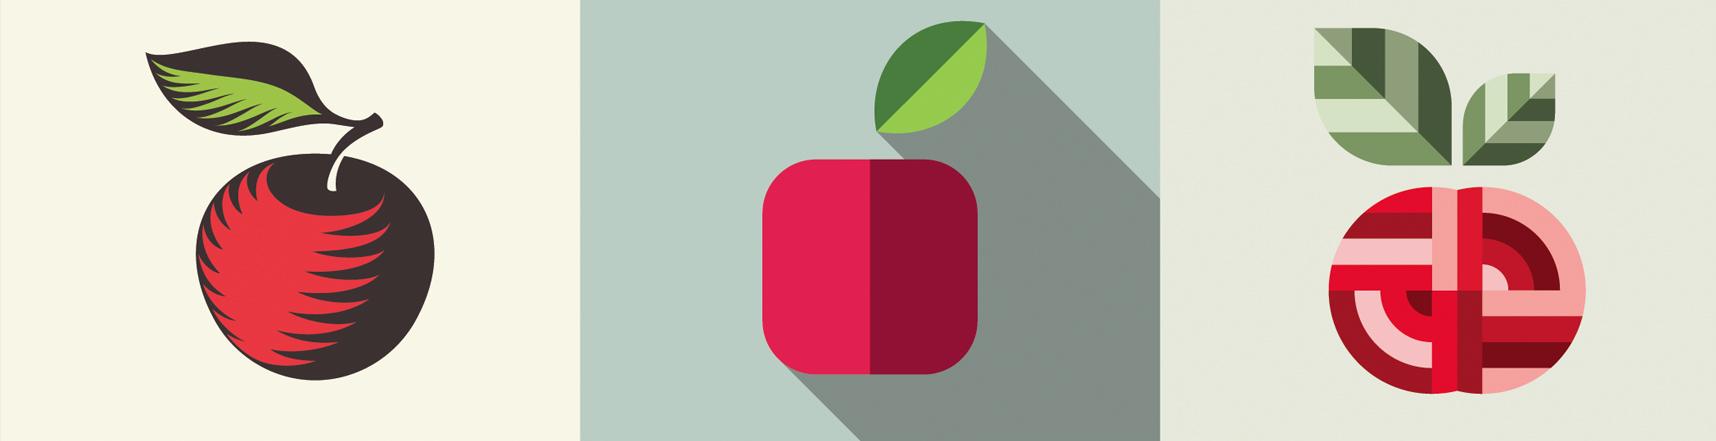 Apple_Resources3.jpg